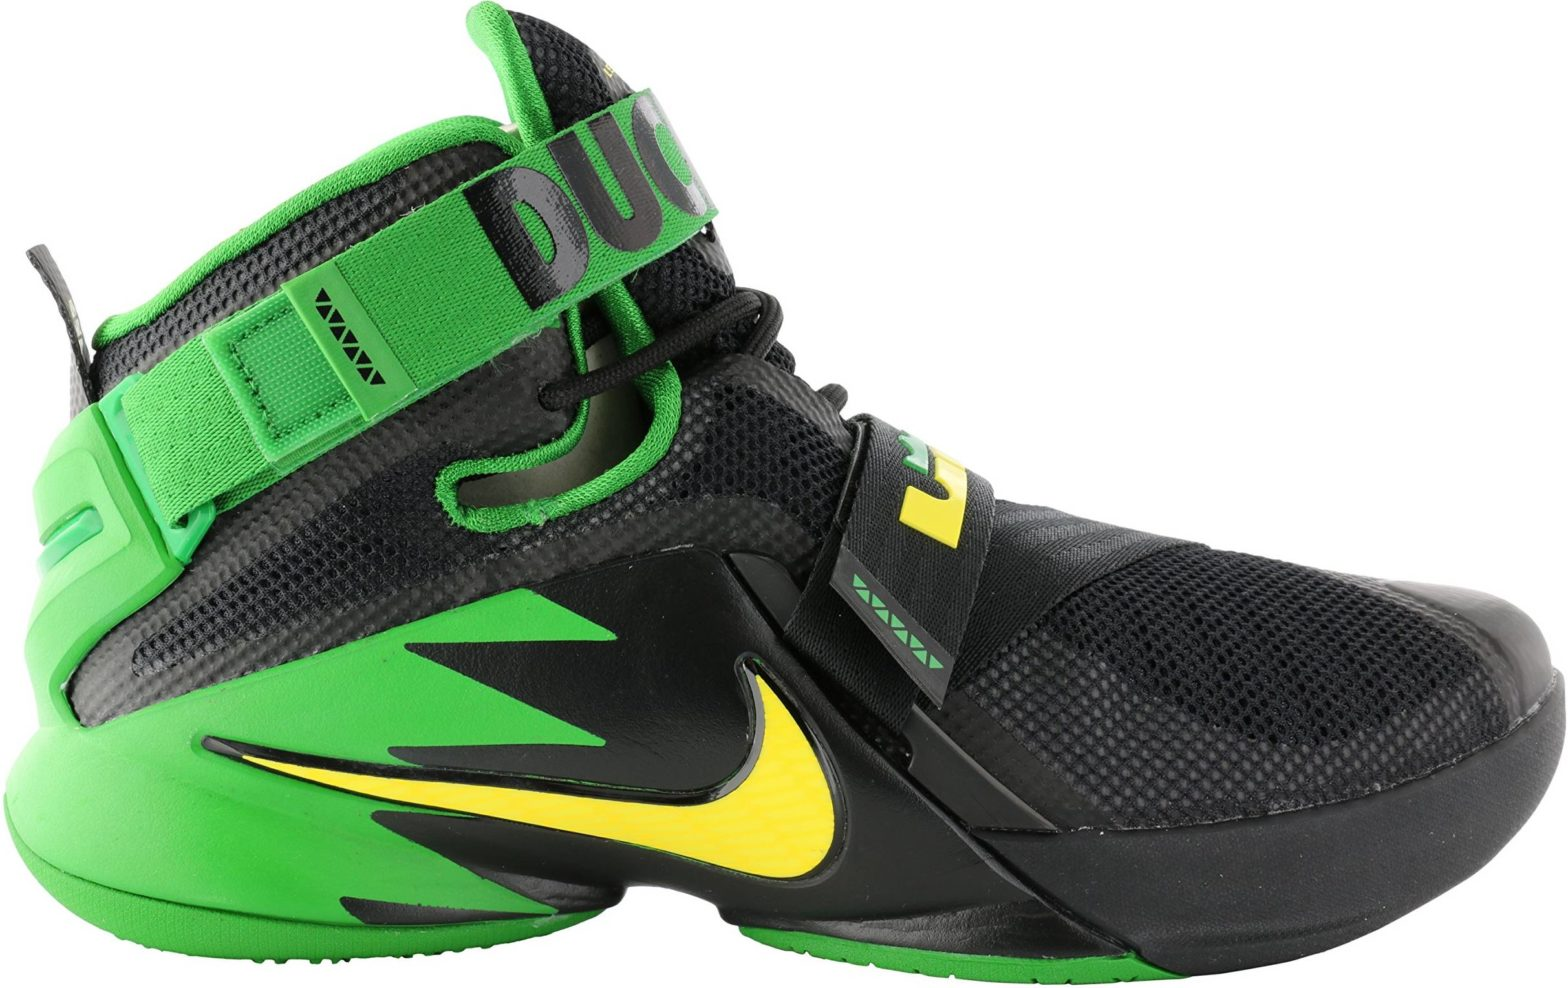 Nike Lebron Soldier IX Basketball Shoes